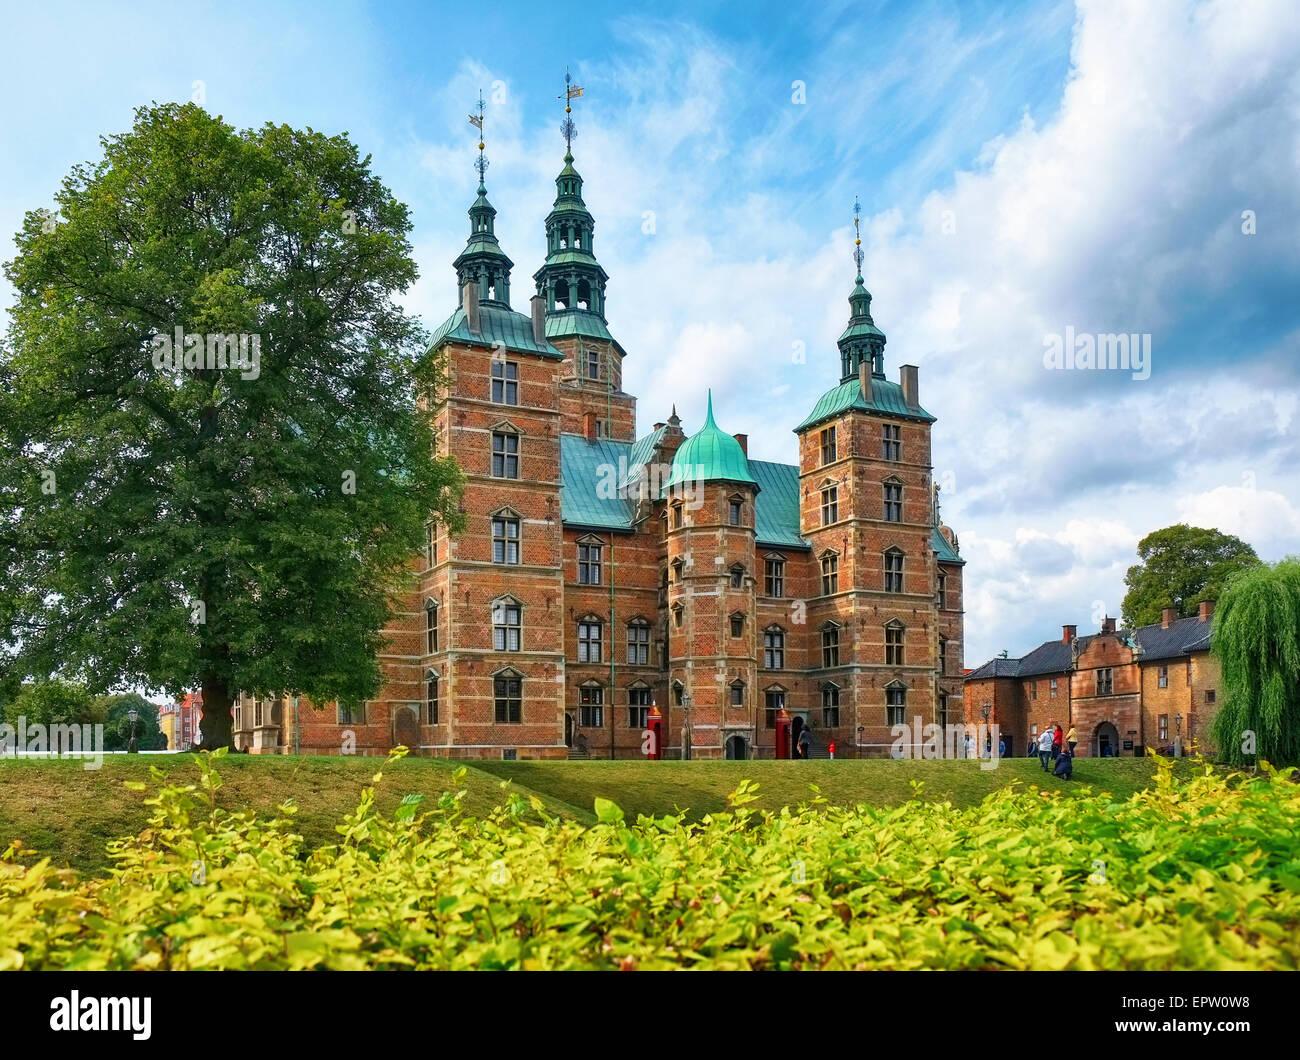 Rosenborg Castle in Copenhagen, Denmark.  It was built in the Dutch Renaissance style in 1606 during the reign of - Stock Image